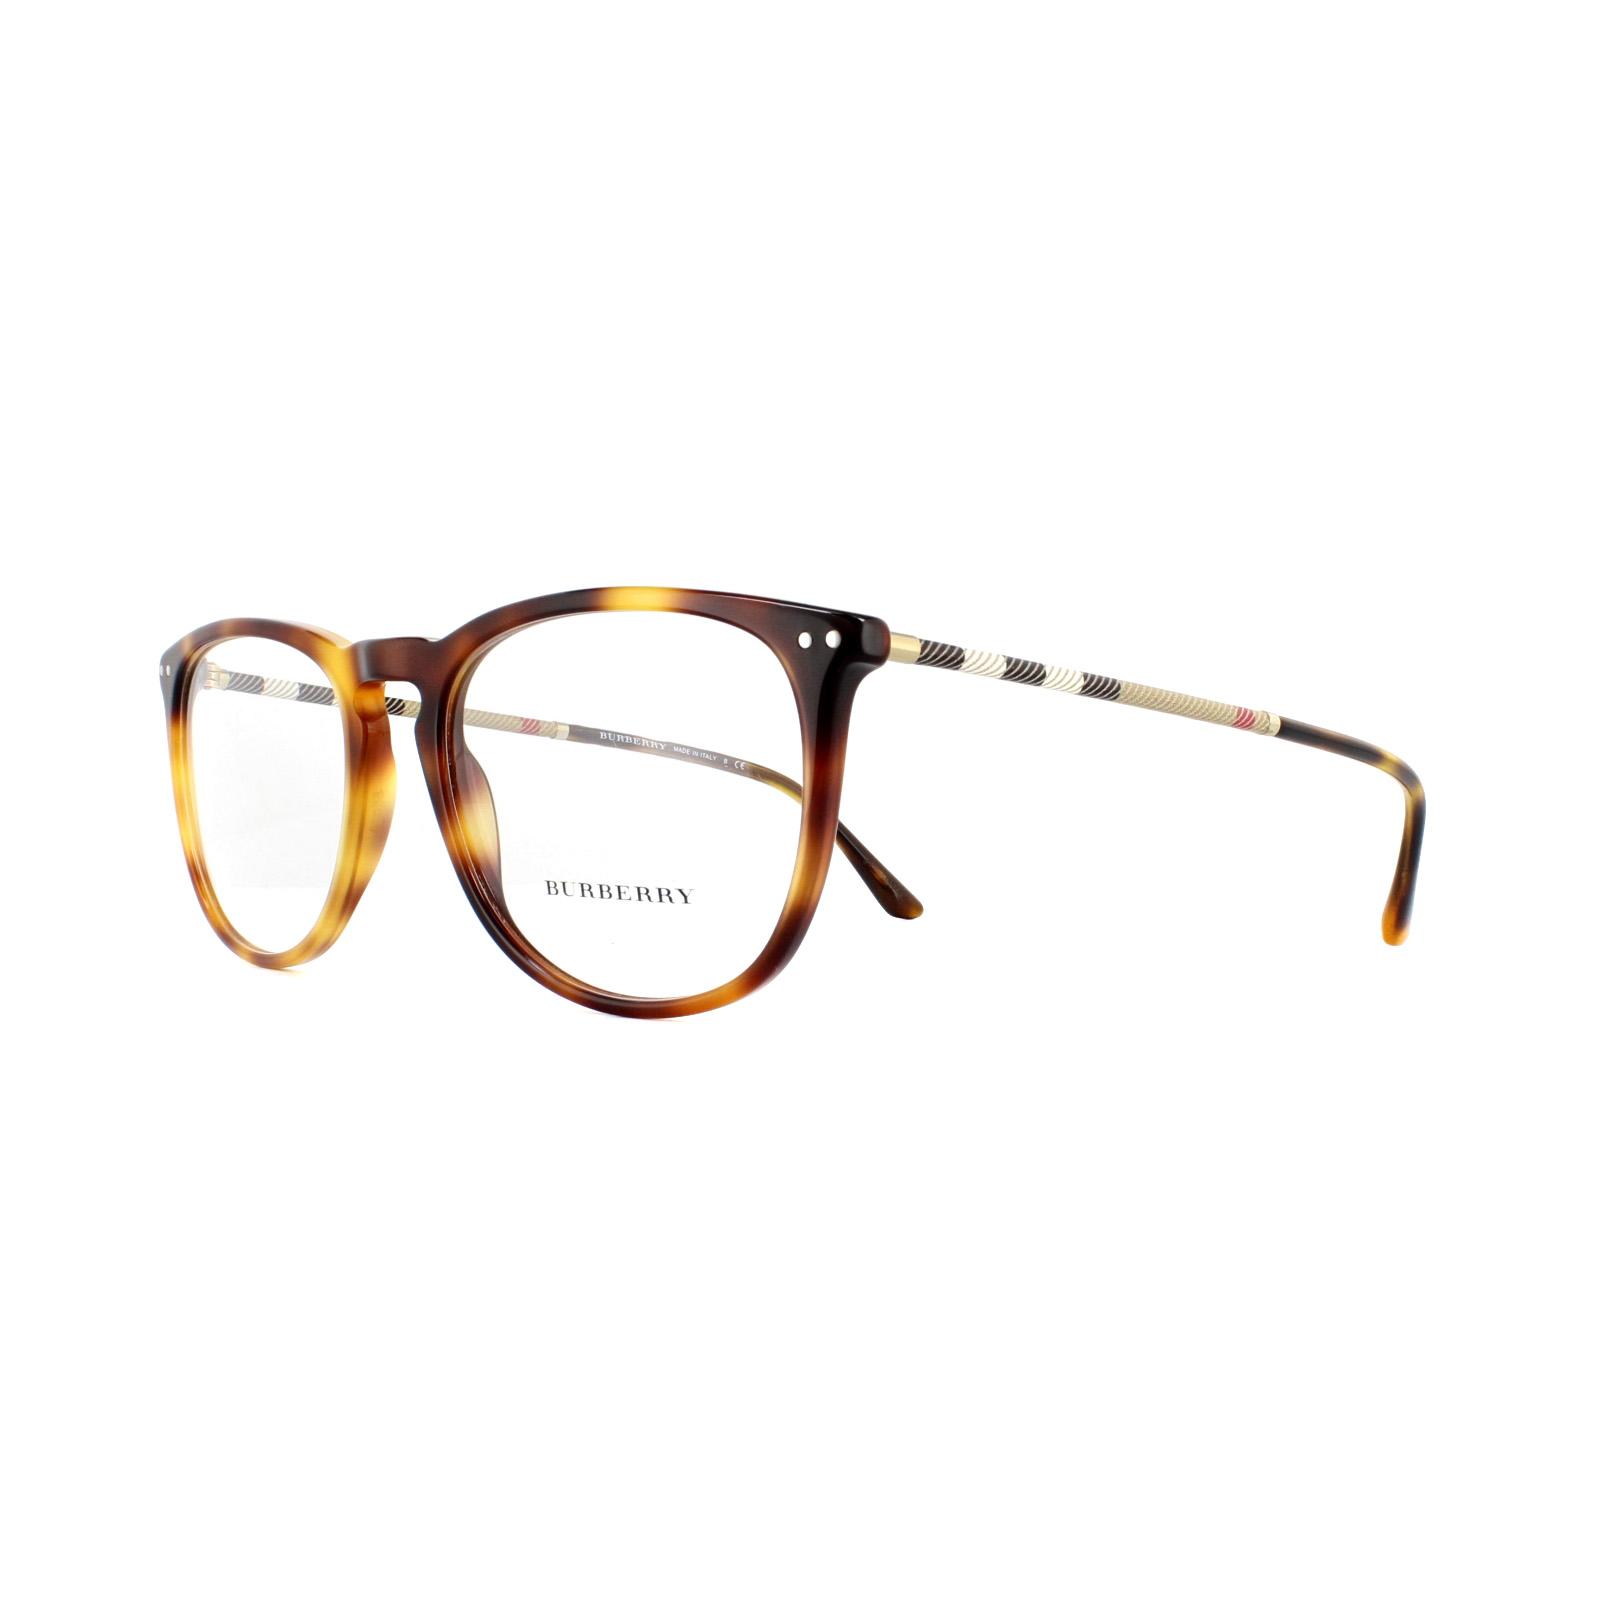 a28e0a7436a Sentinel Burberry Glasses Frames BE 2258Q 3316 Light Havana 55mm Mens